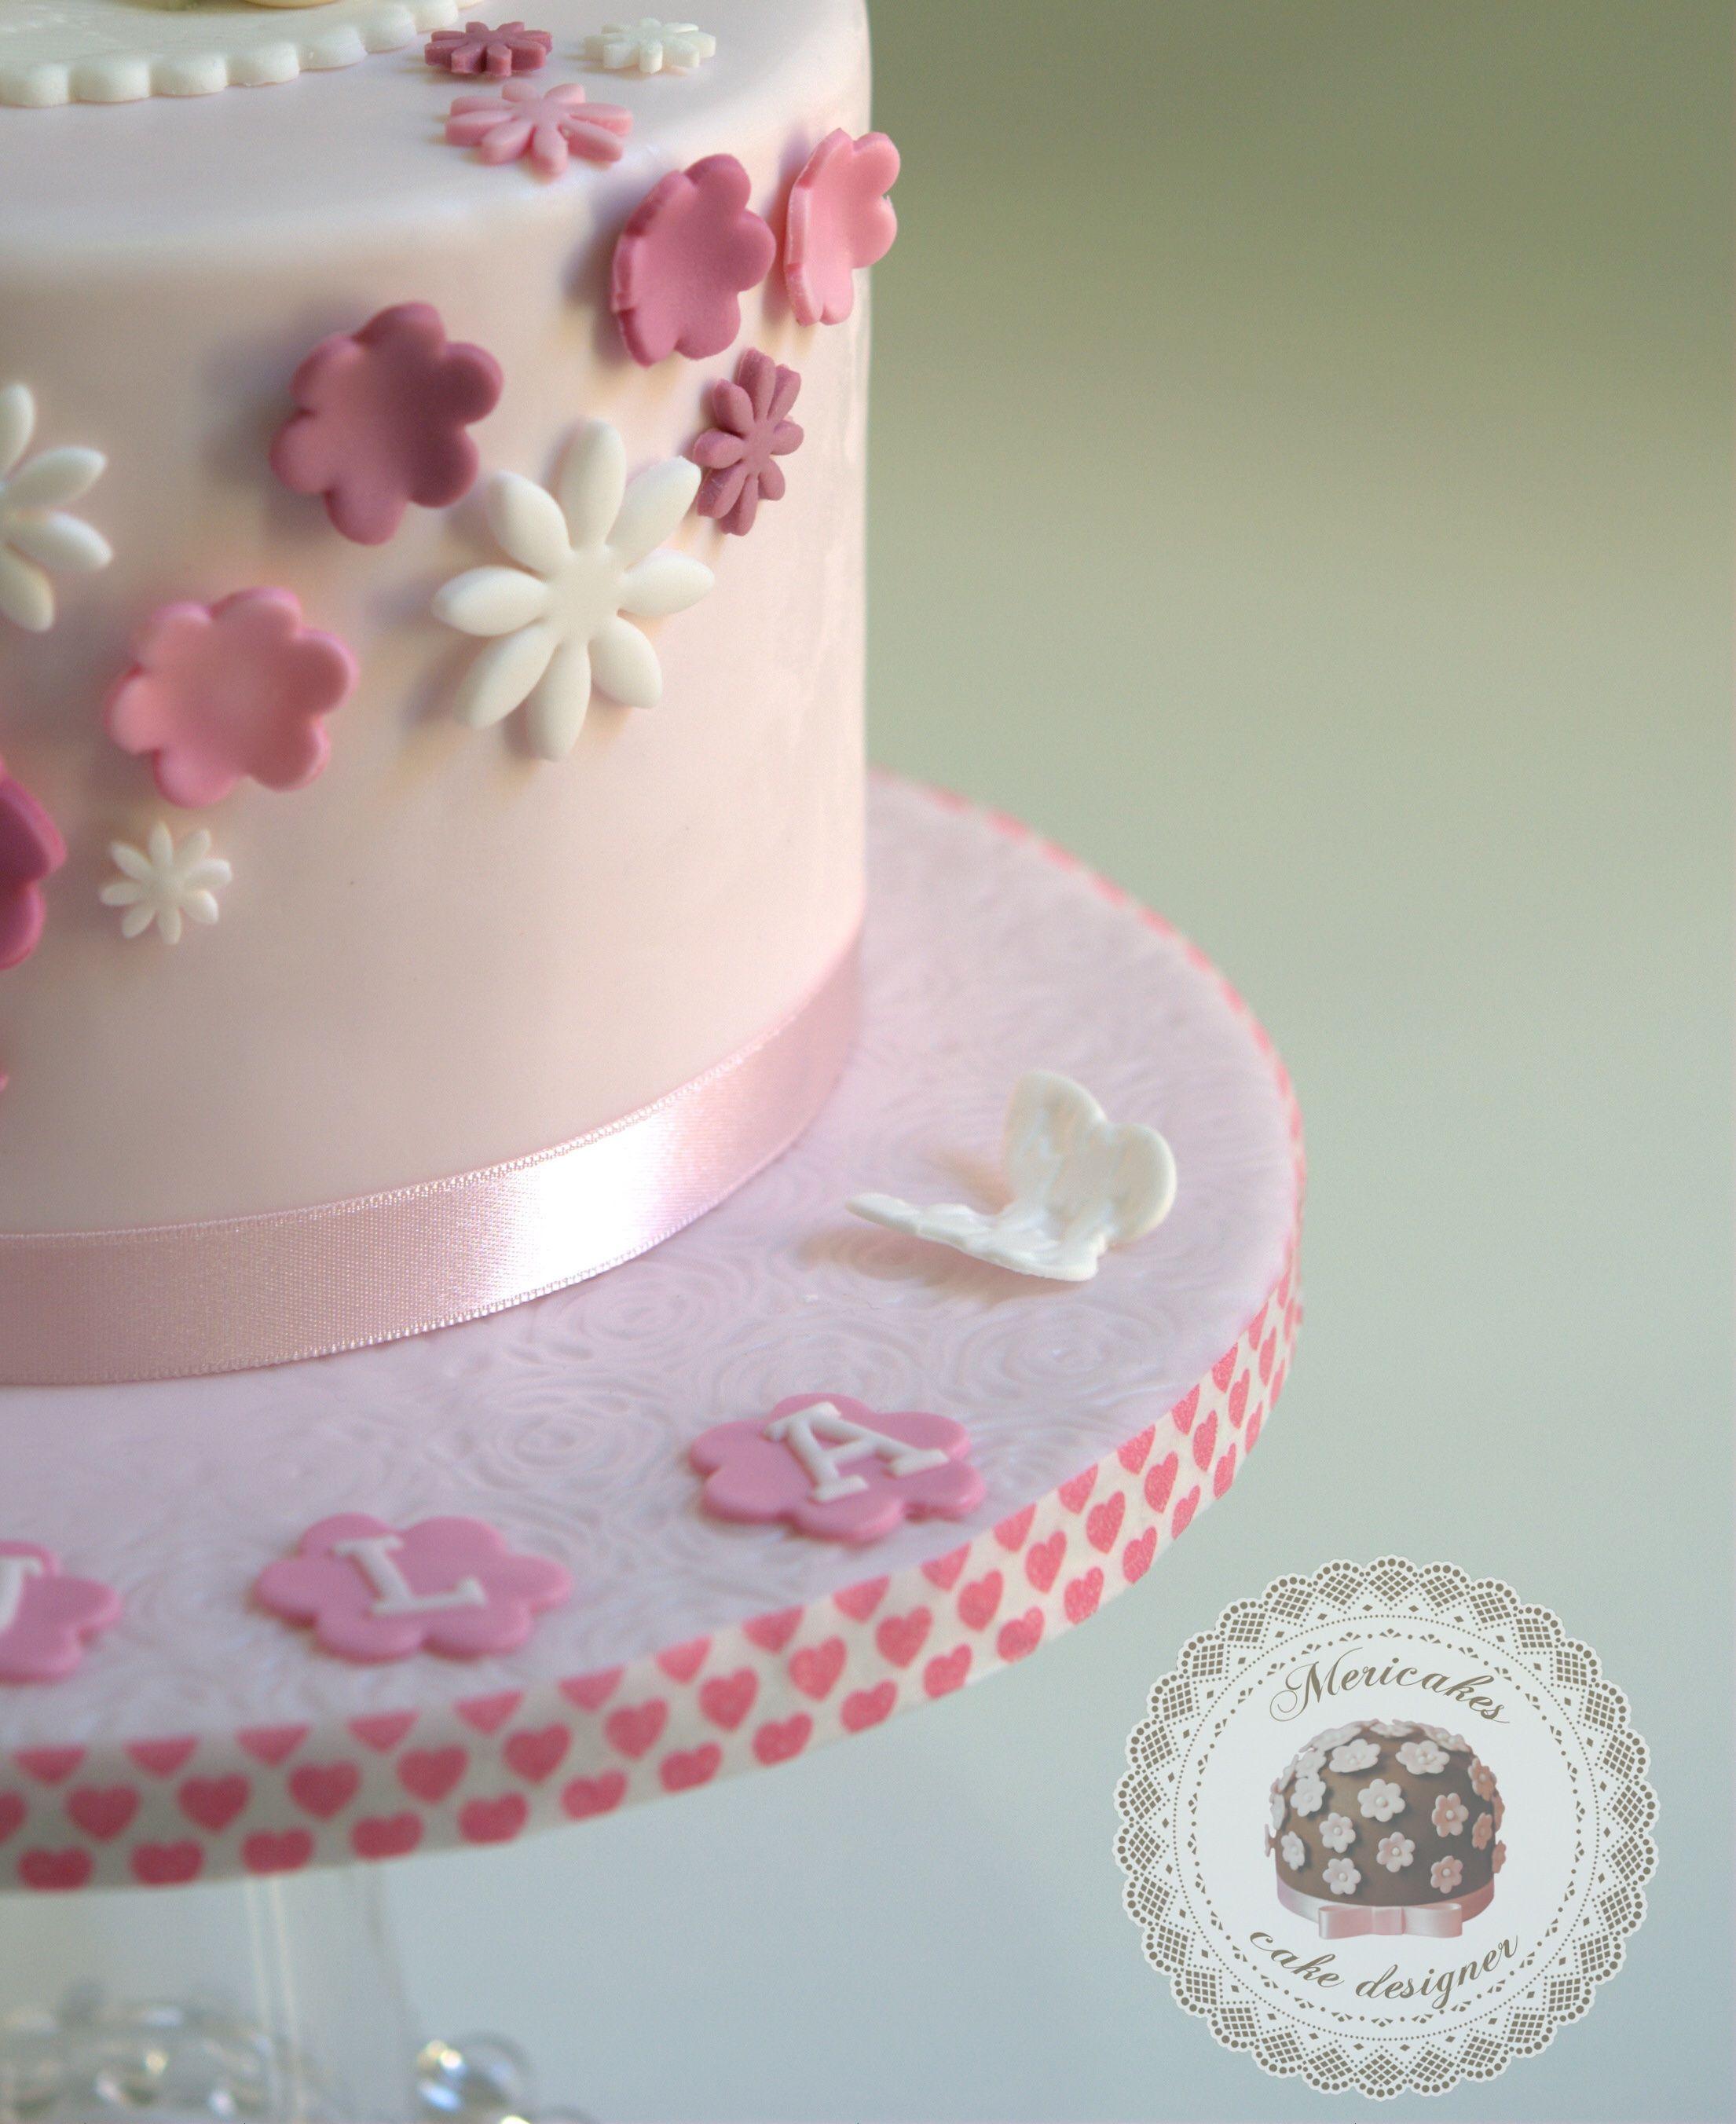 Decoracion de tortas para bautismo con fondant buscar - Decoracion de tortas ...